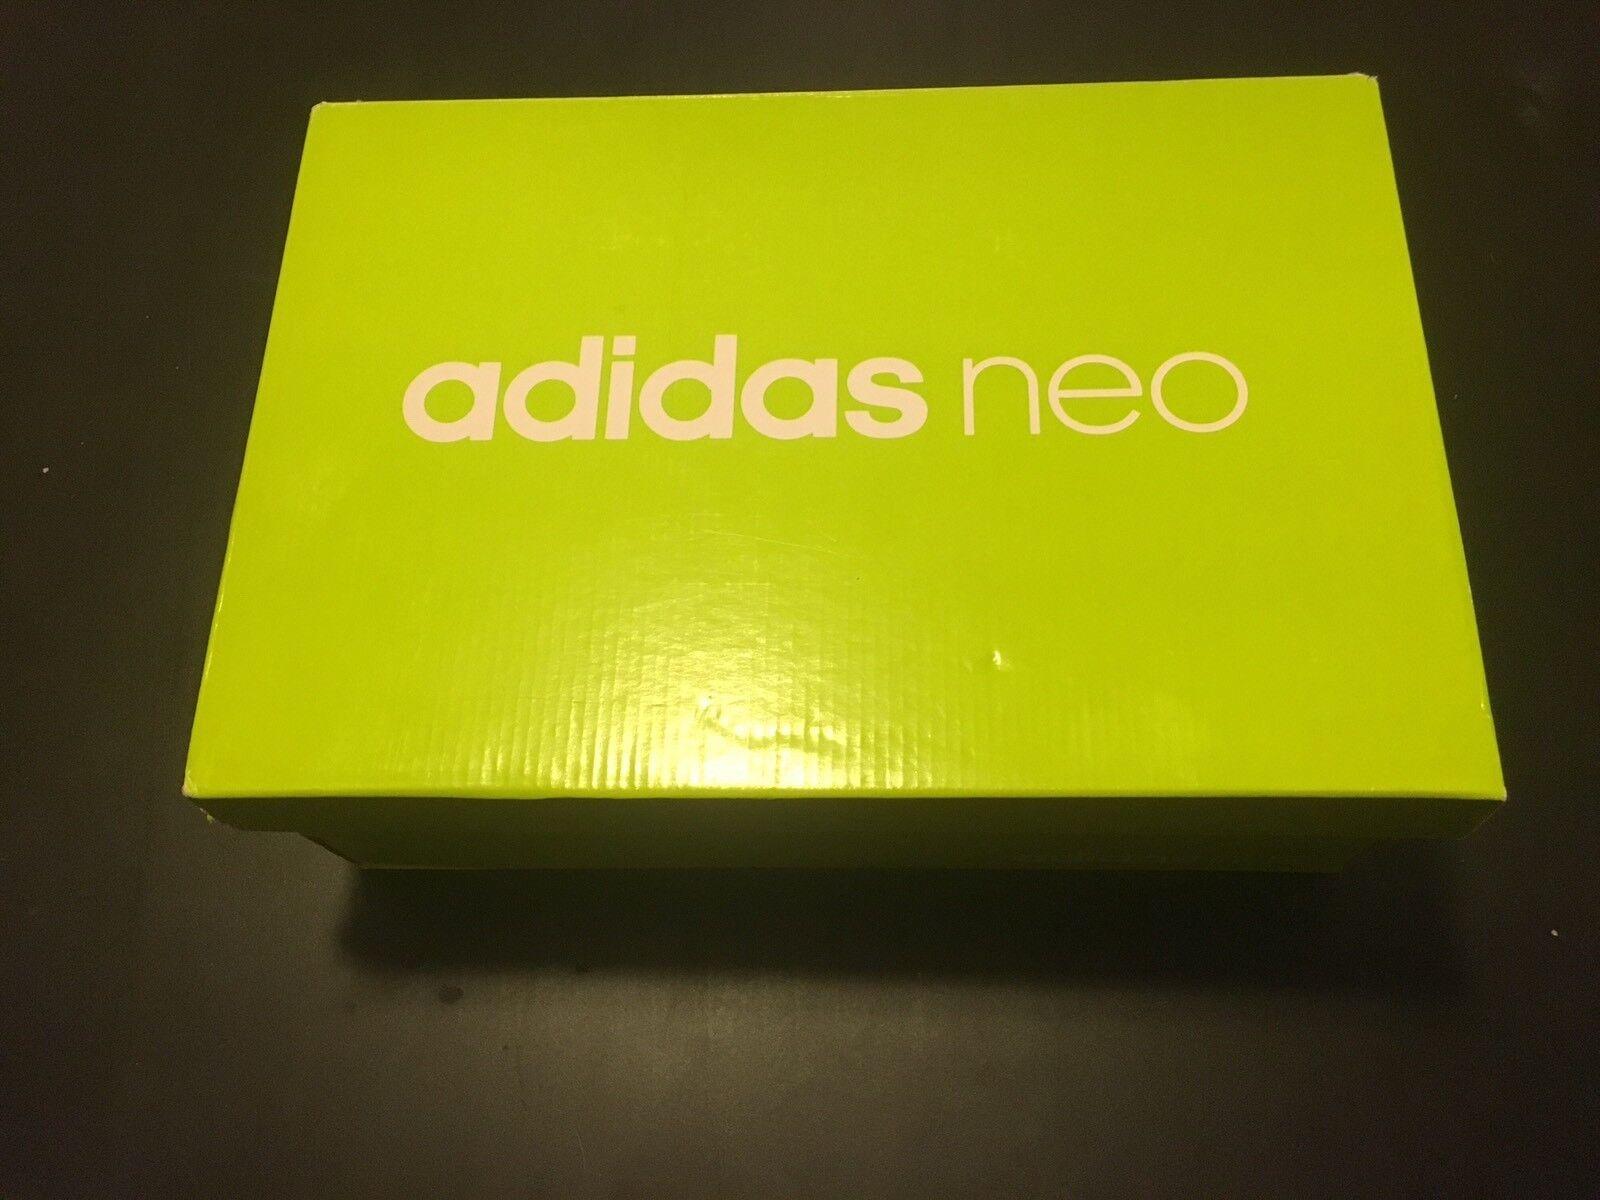 adidas neo - vs - tempo b74316 männer grau - vs weiß leder schuhe in größe 10 nib 664ac9